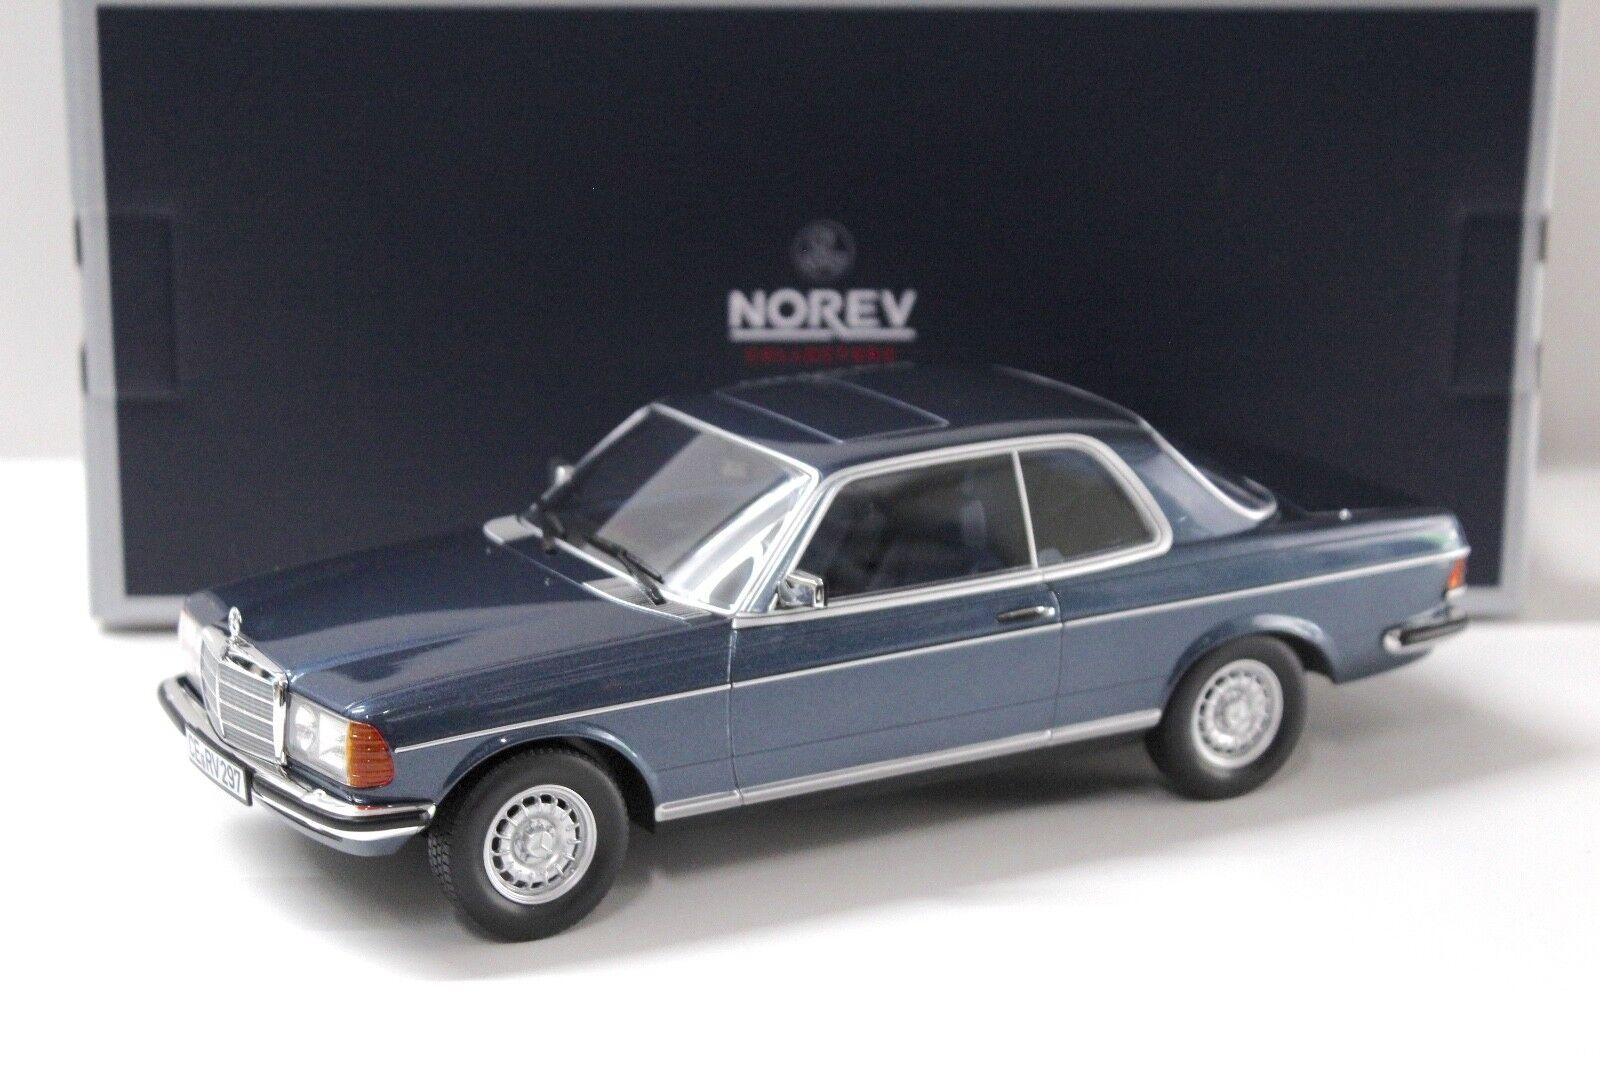 1 18 NOREV MERCEDES 280 280 280 CE Coupe 1980 blu NEW in Premium-MODELCARS dfc8f8